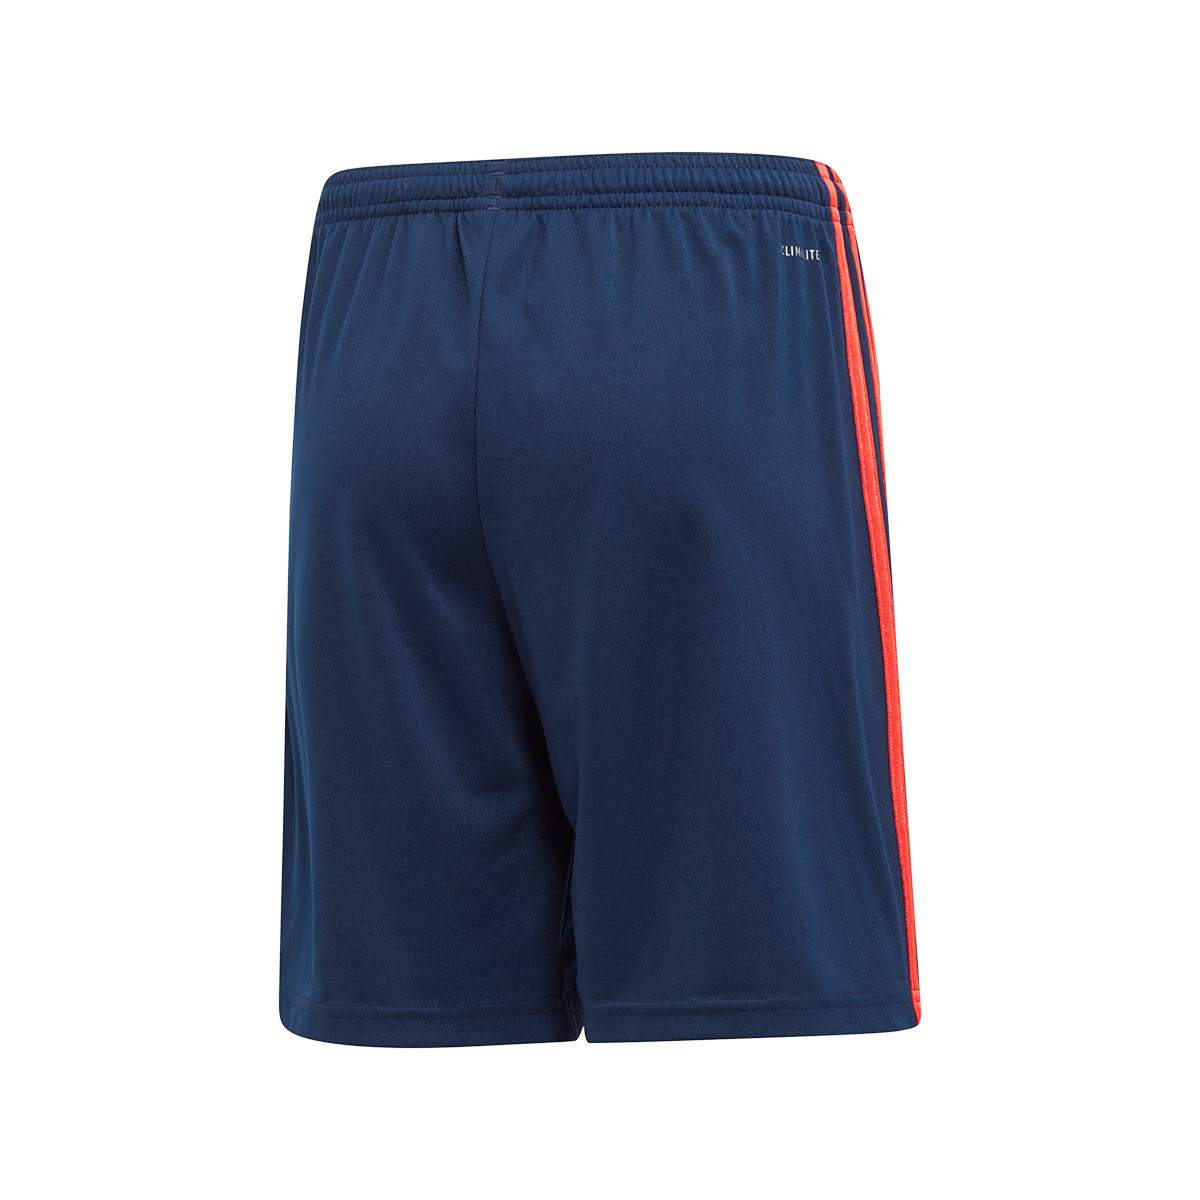 pantaloni adidas 2020